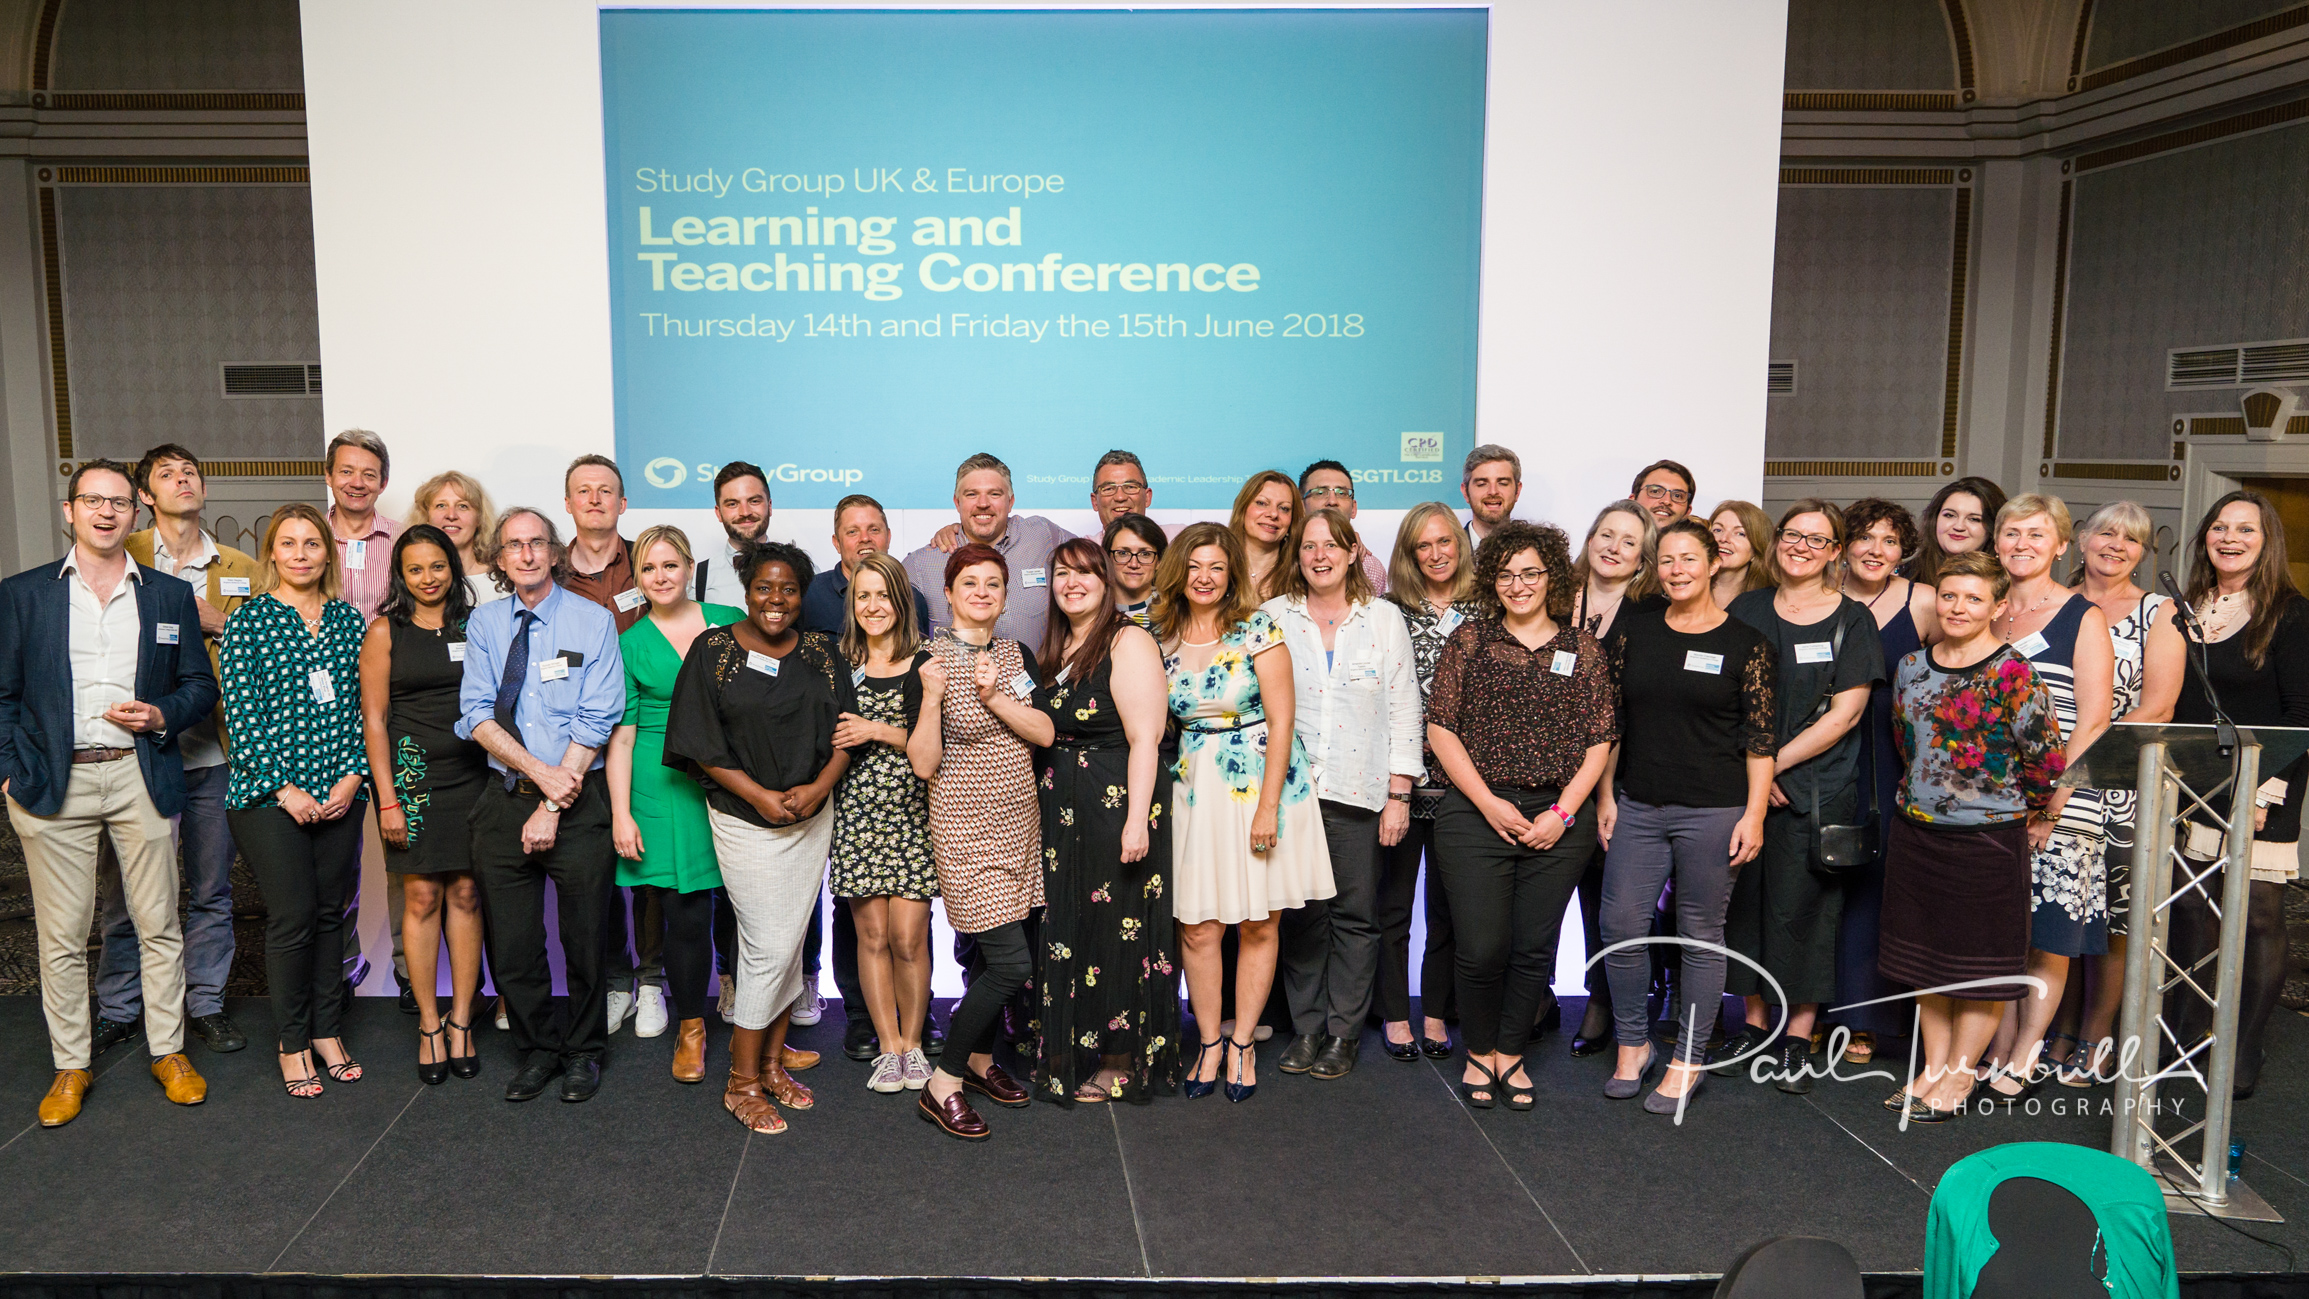 conference-event-photographer-queens-hotel-leeds-yorkshire-035.jpg